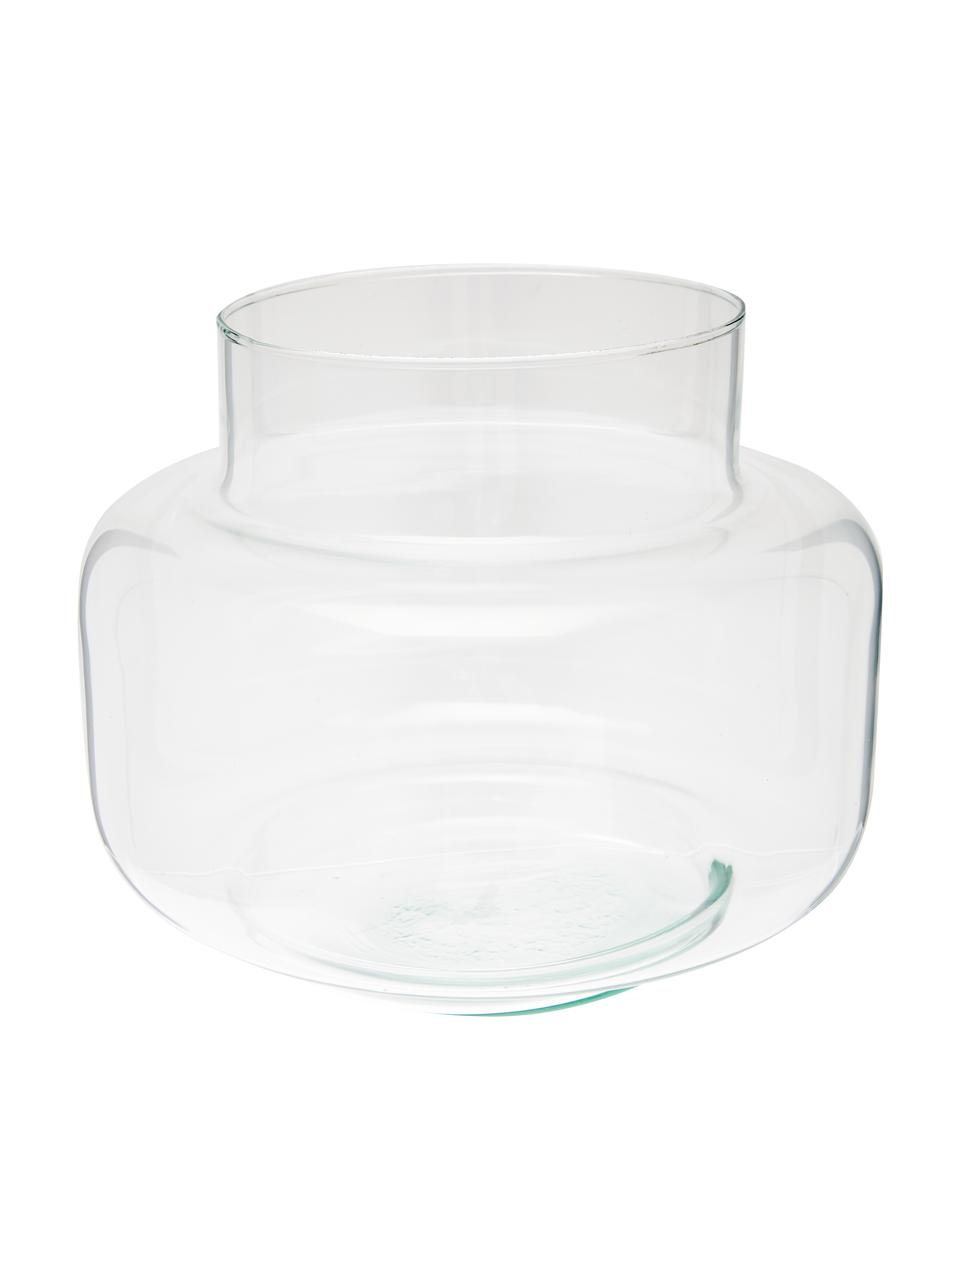 Vase Dalia aus recyceltem Glas, Recyceltes Glas, Transparent, Ø 22 x H 18 cm